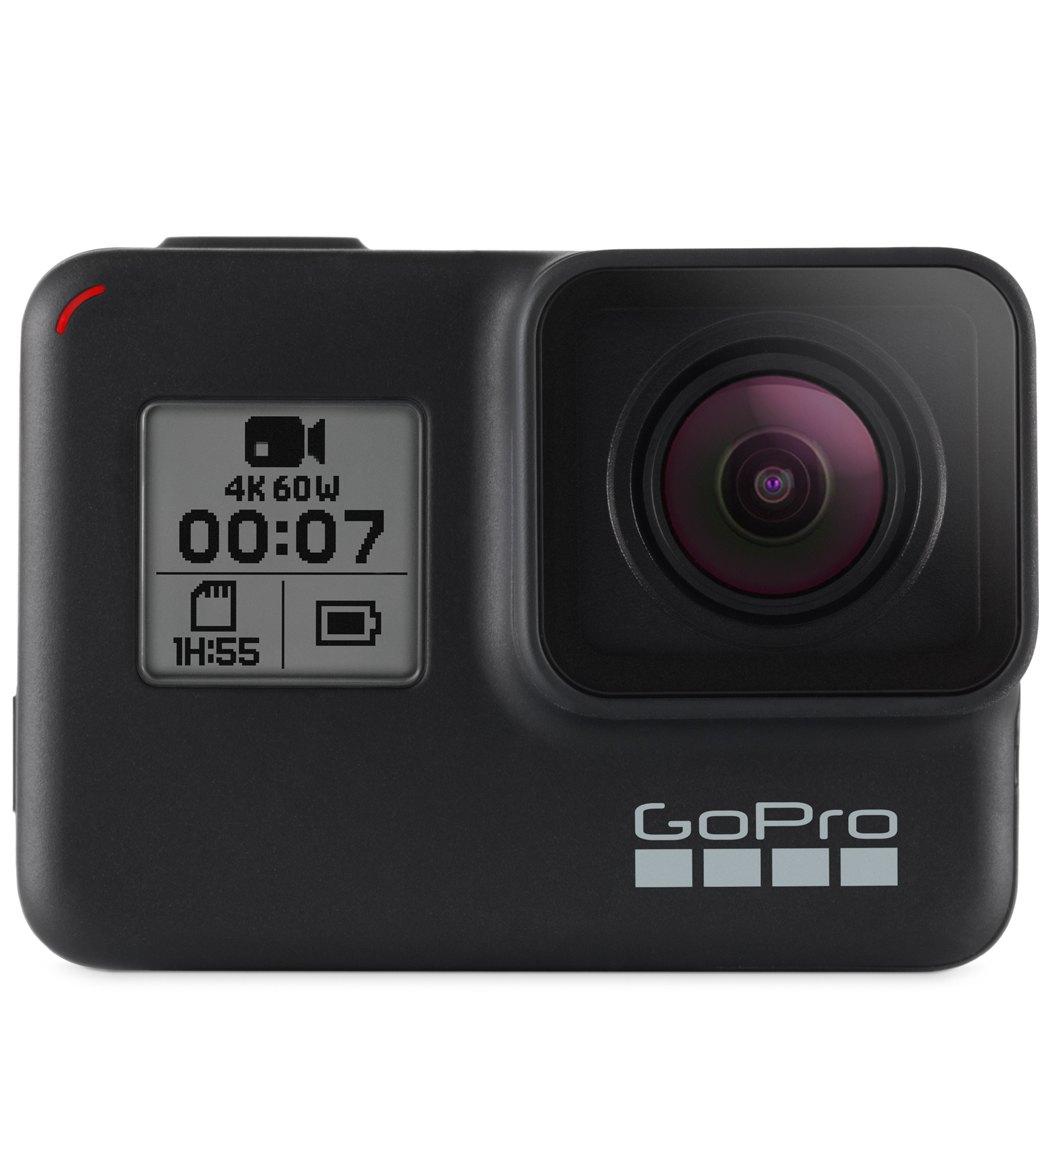 c3c37cc98291c GoPro Hero 7 Black at SwimOutlet.com - Free Shipping